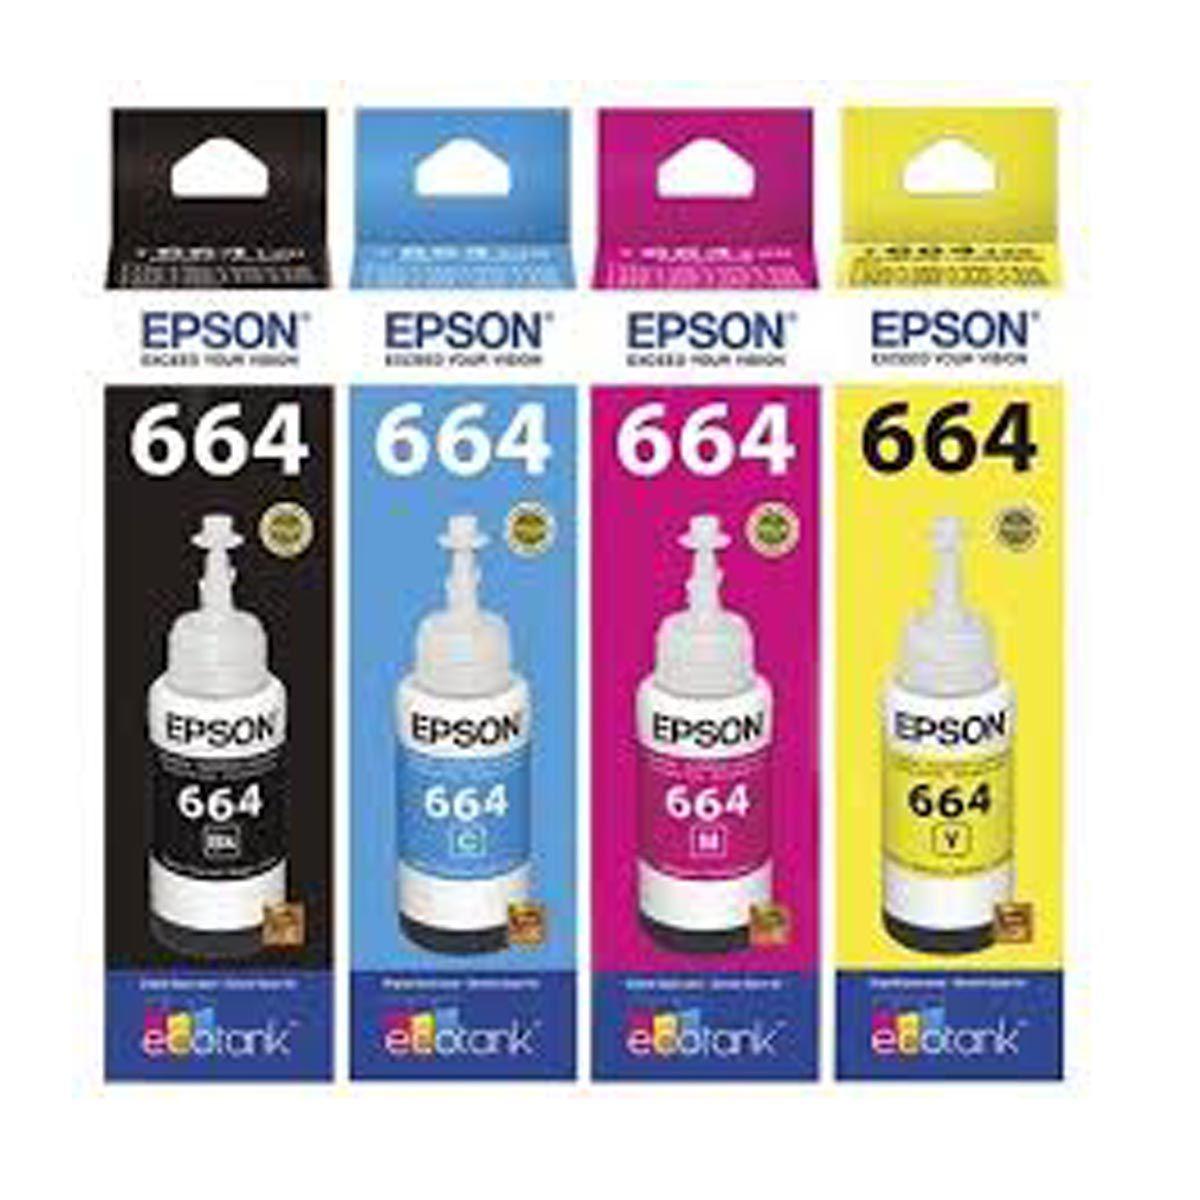 kit 4 Tinta Epson T664120 T664220 T664320 T664420 L3150 L395 L355 L555 L365 L455 L396 - Original 70m